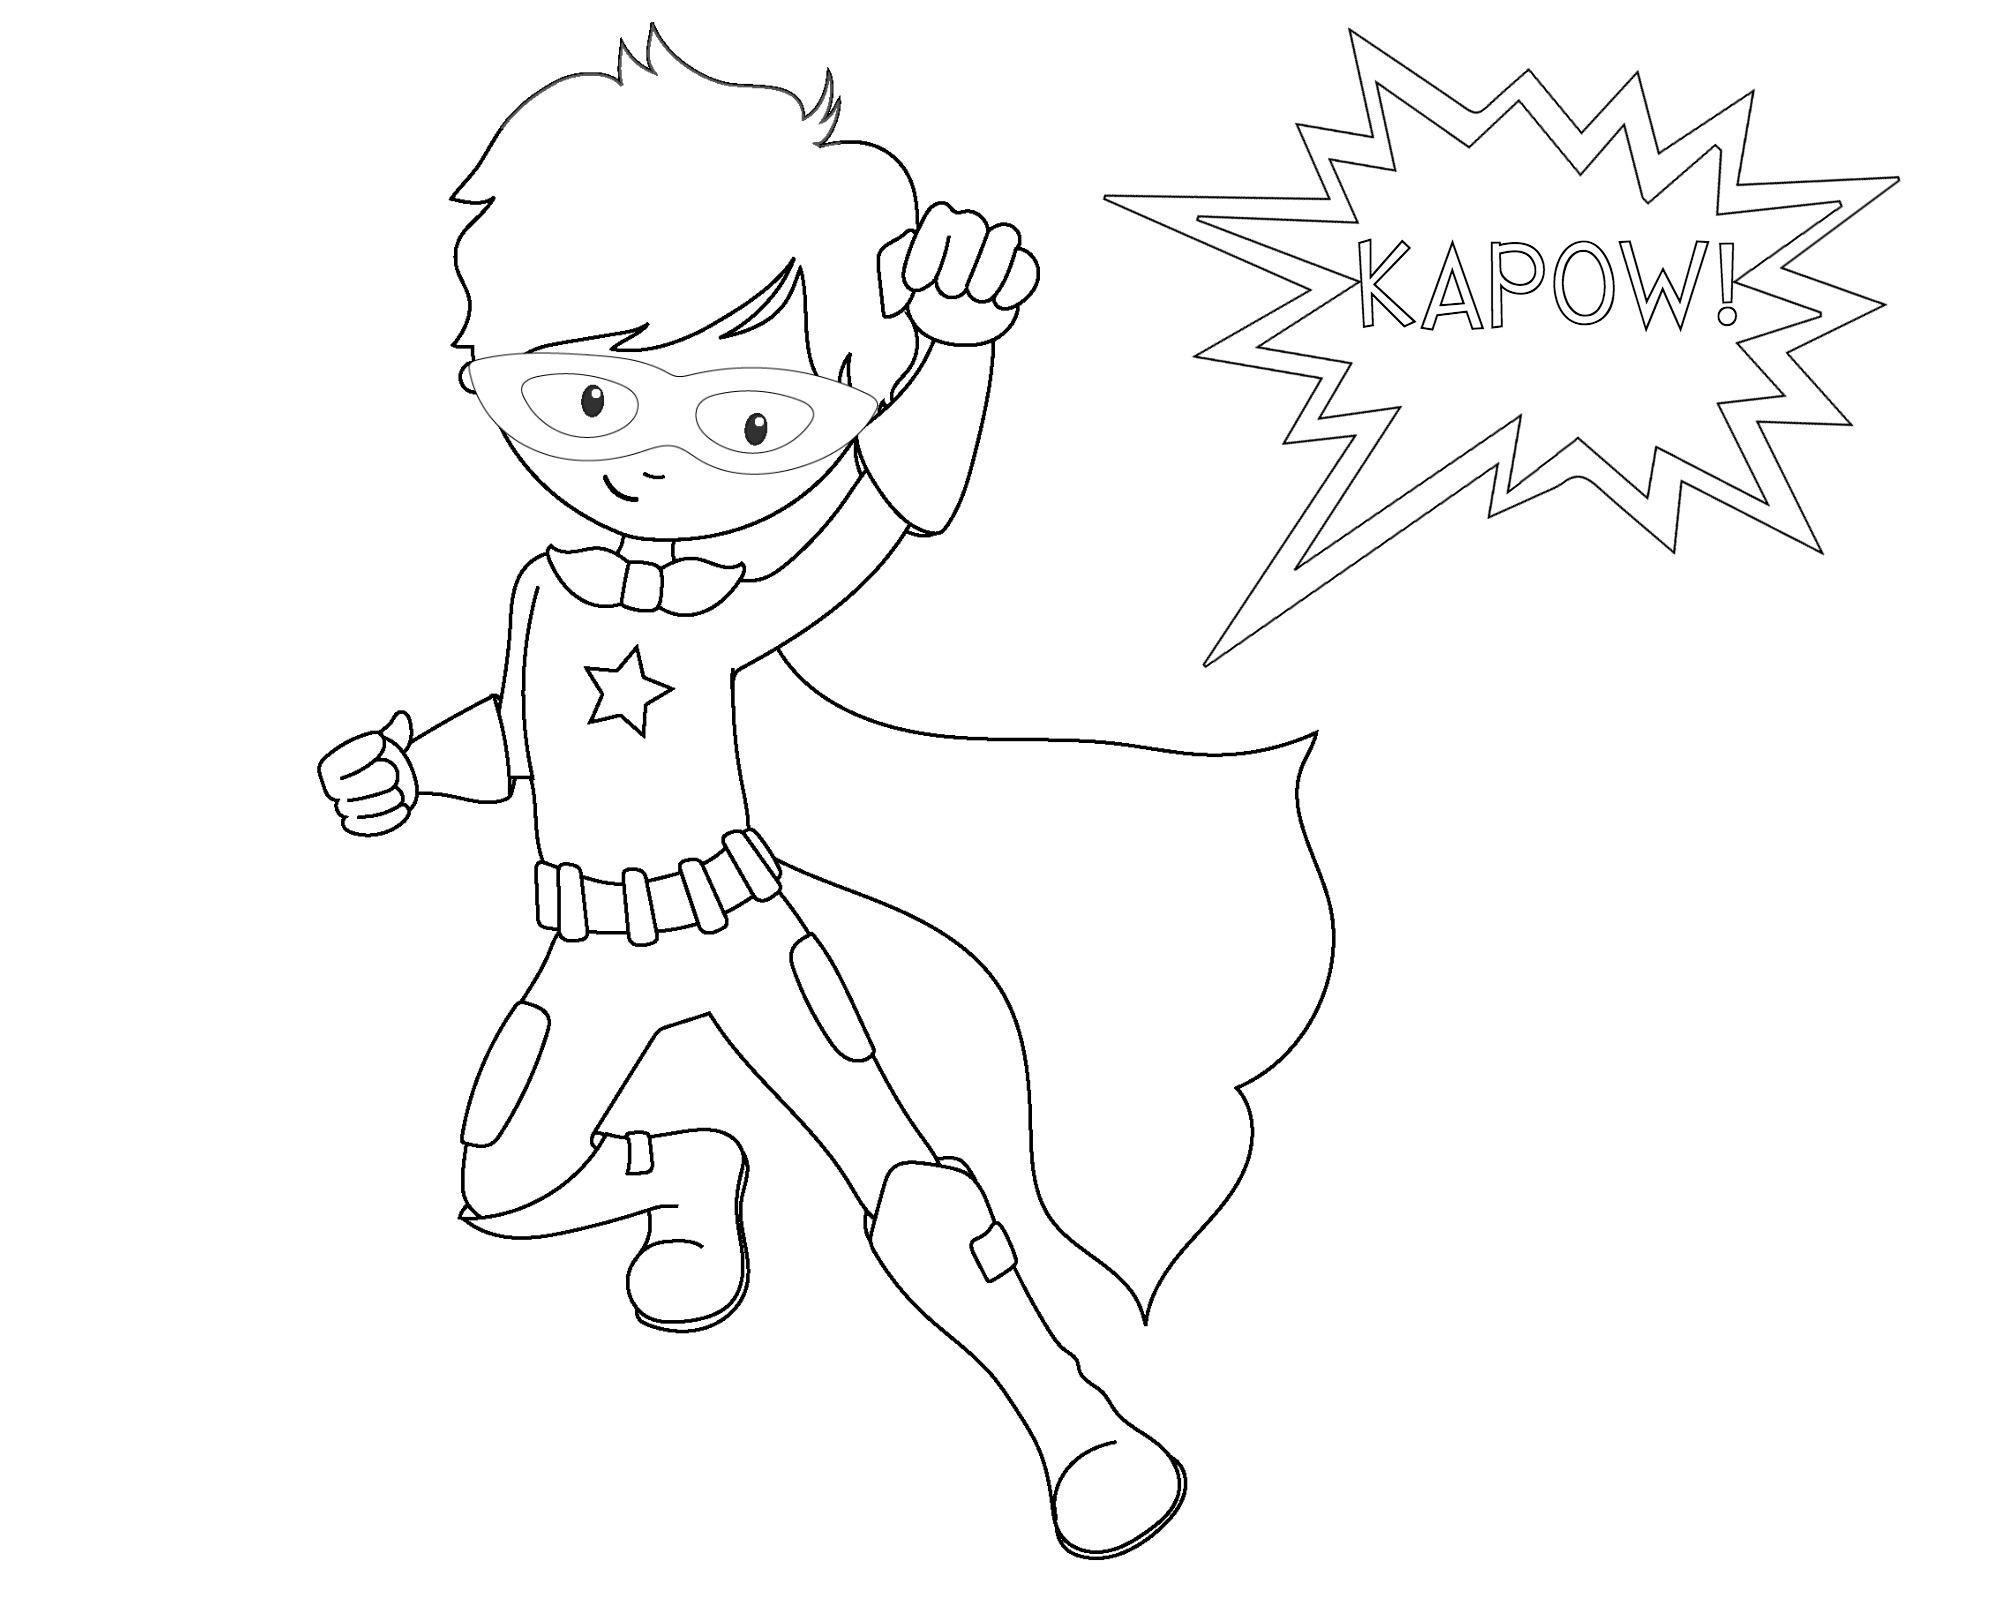 16 Coloring Page Superhero Super Hero Coloring Sheets Superhero Coloring Superhero Coloring Pages